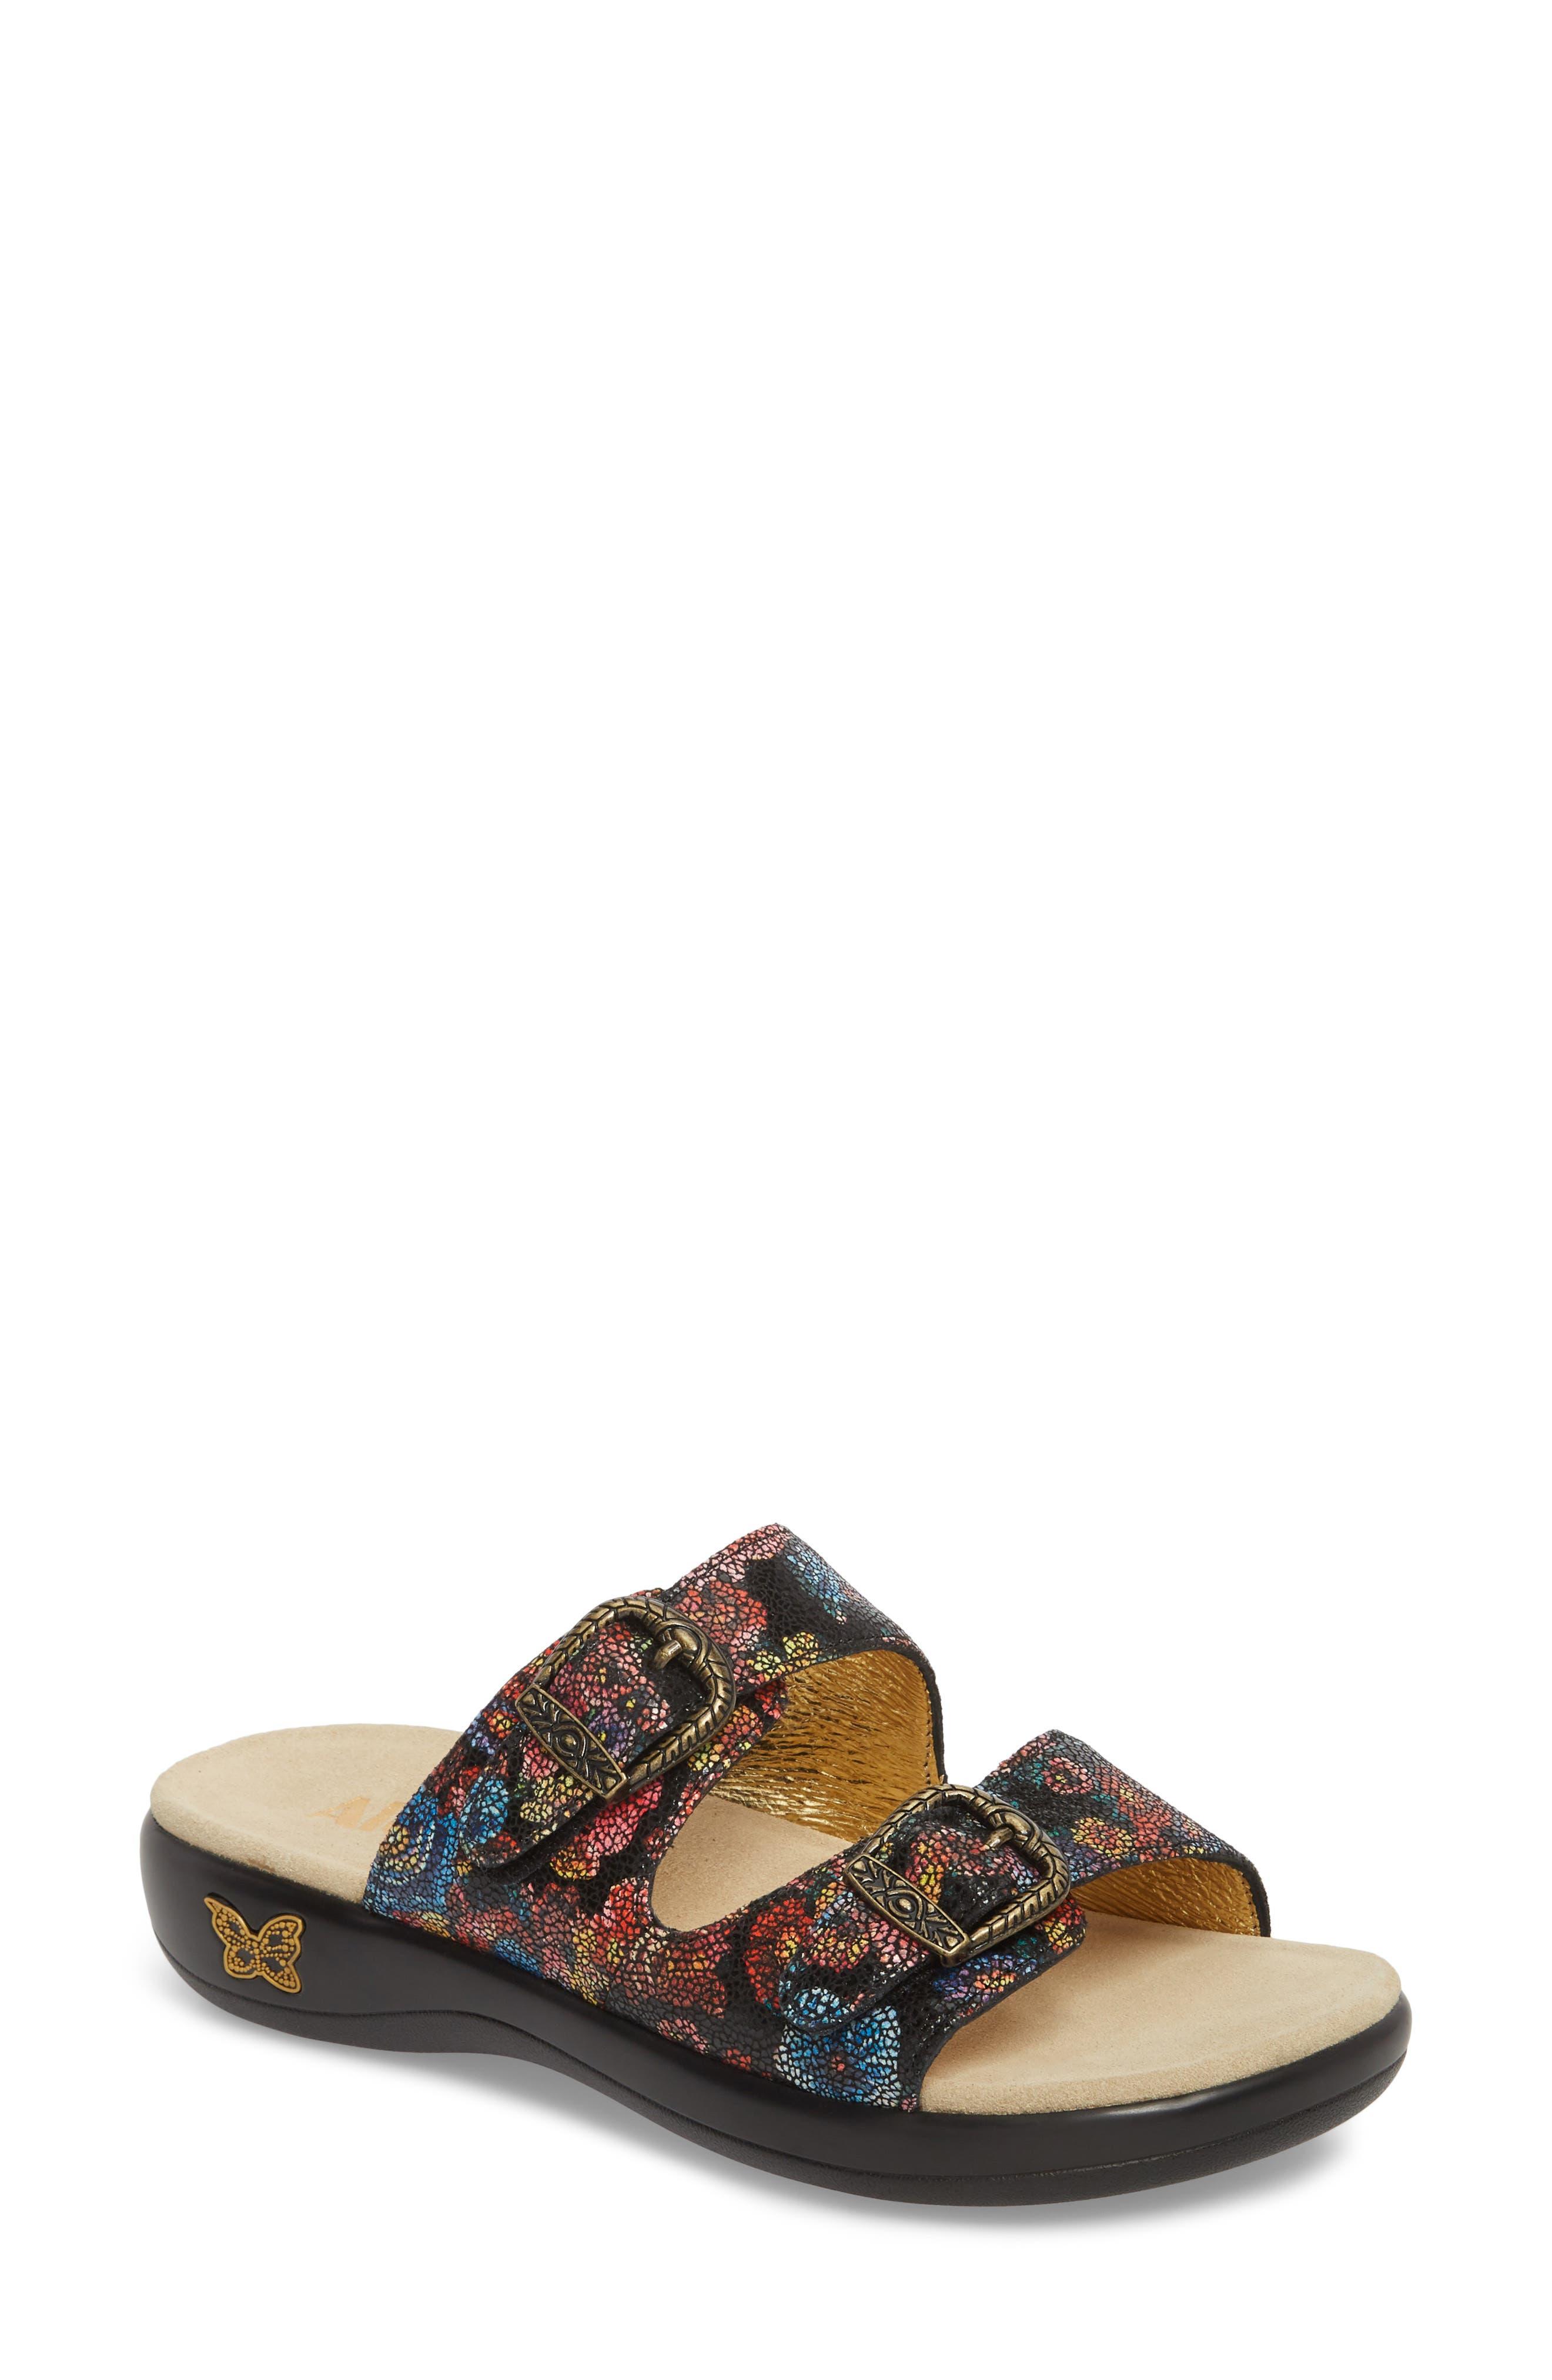 Jade Sandal,                             Main thumbnail 1, color,                             Florensic Files Leather